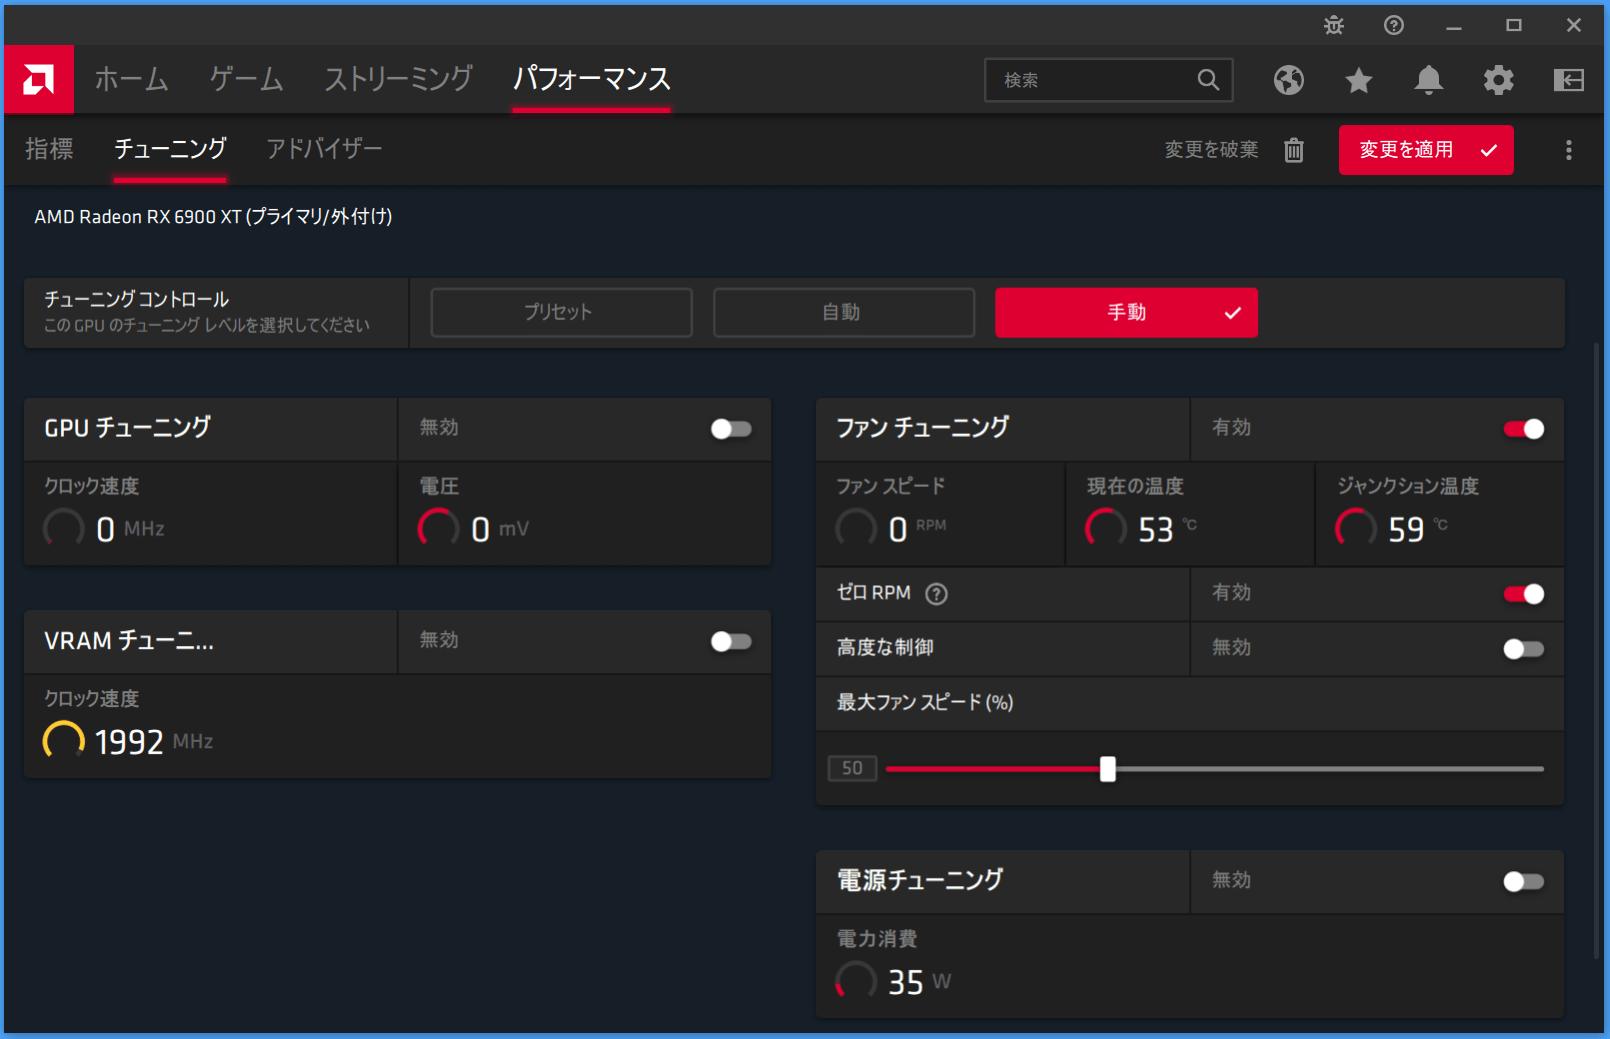 Radeon RX 6900 XT_Radeon-Setting_7-1_Fan